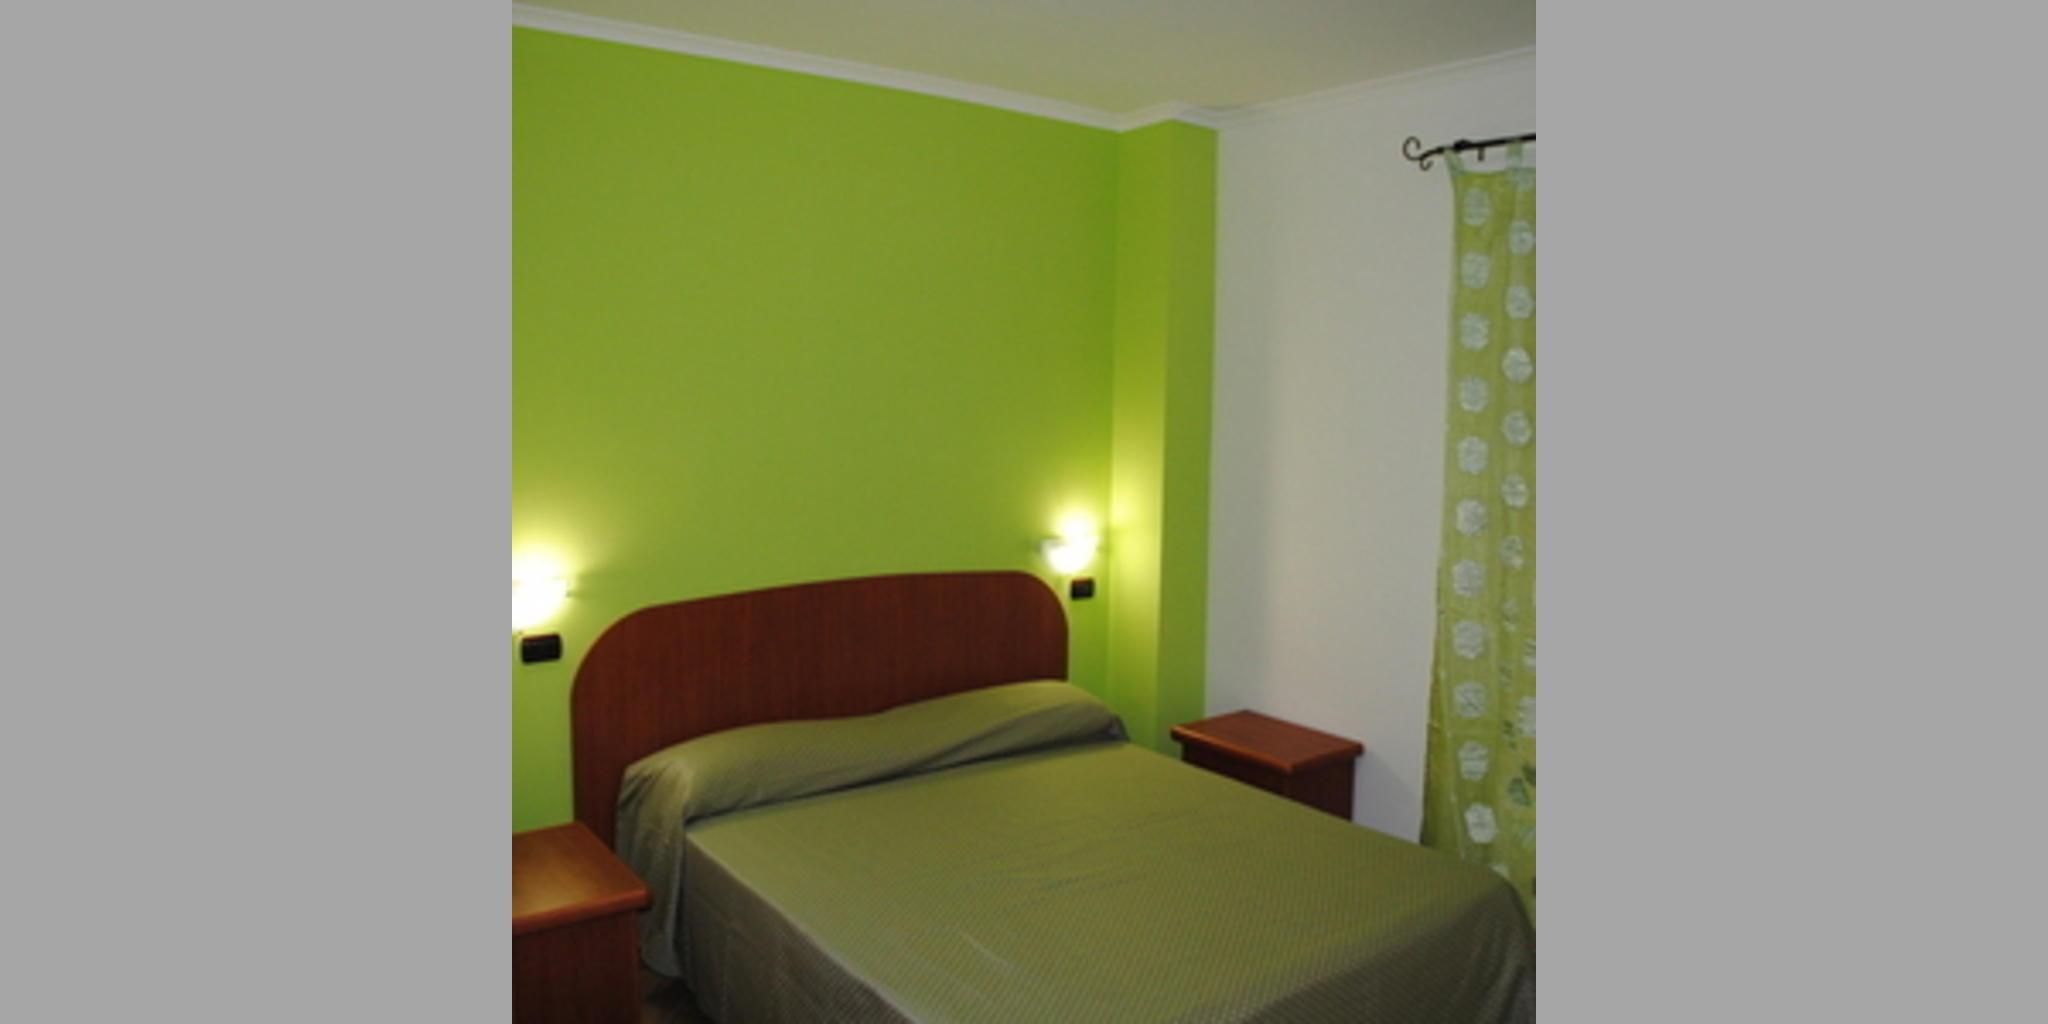 Bed & Breakfast Fiumicino - Isola Sacra